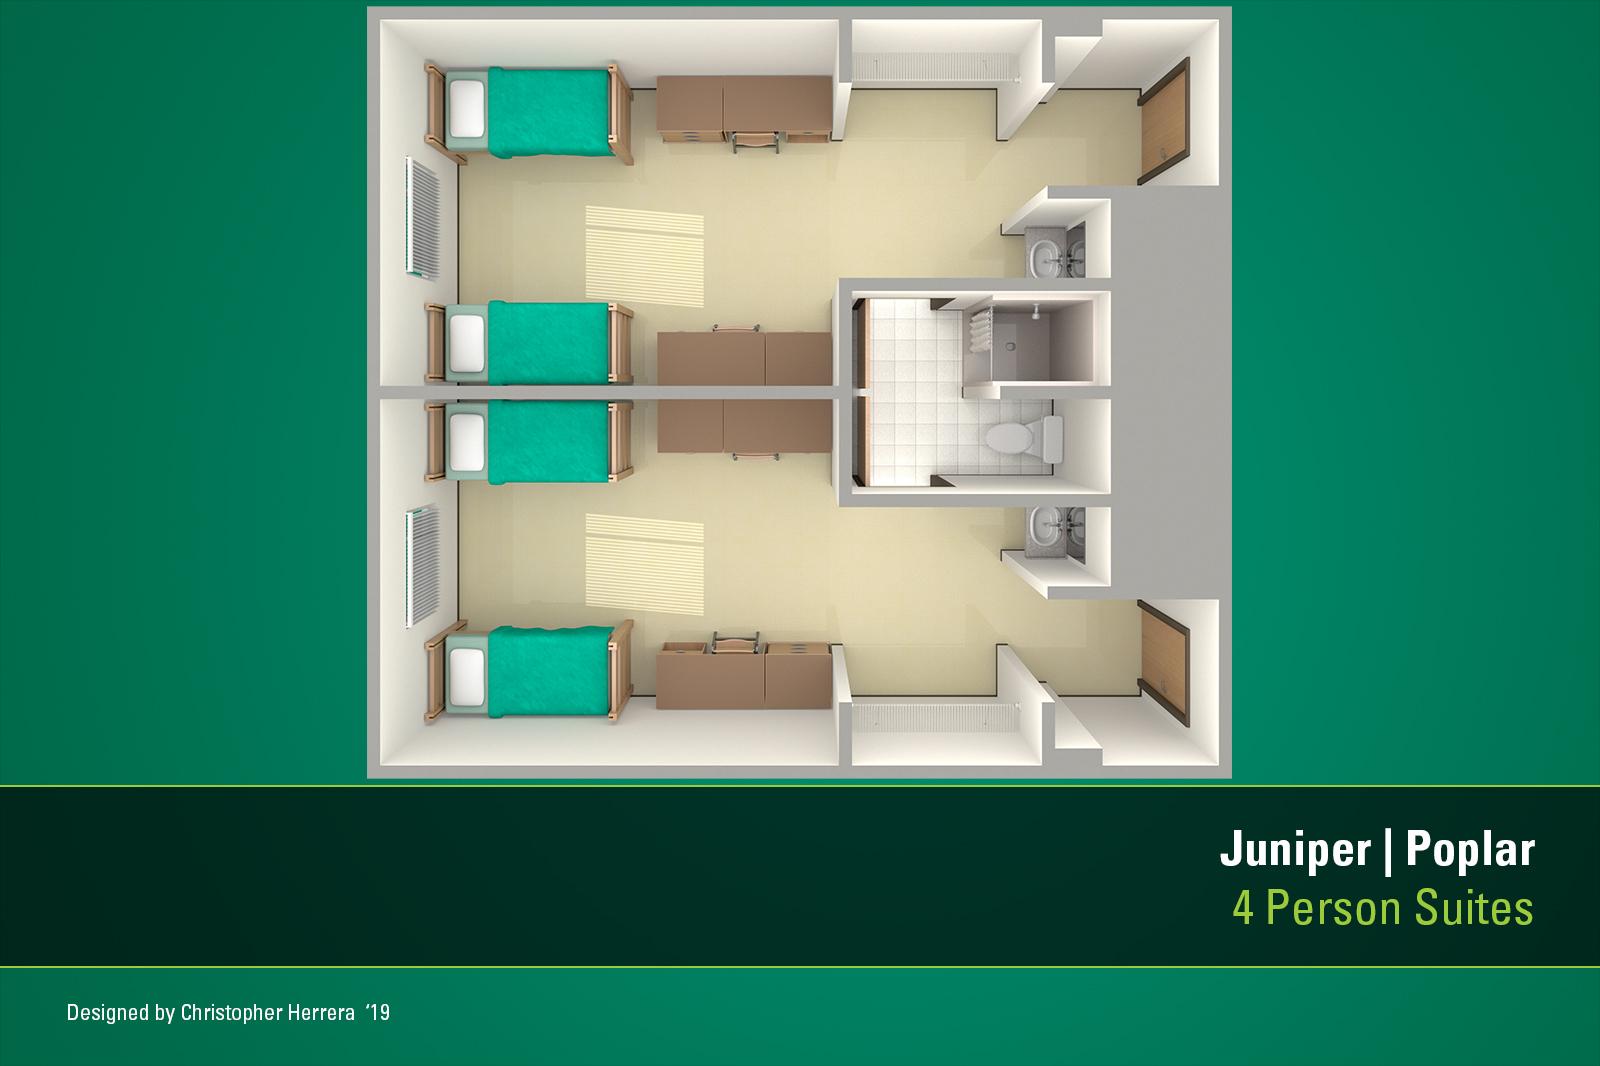 USF's Tampa Campus housing apartment floor plan for Juniper-Poplar Hall.